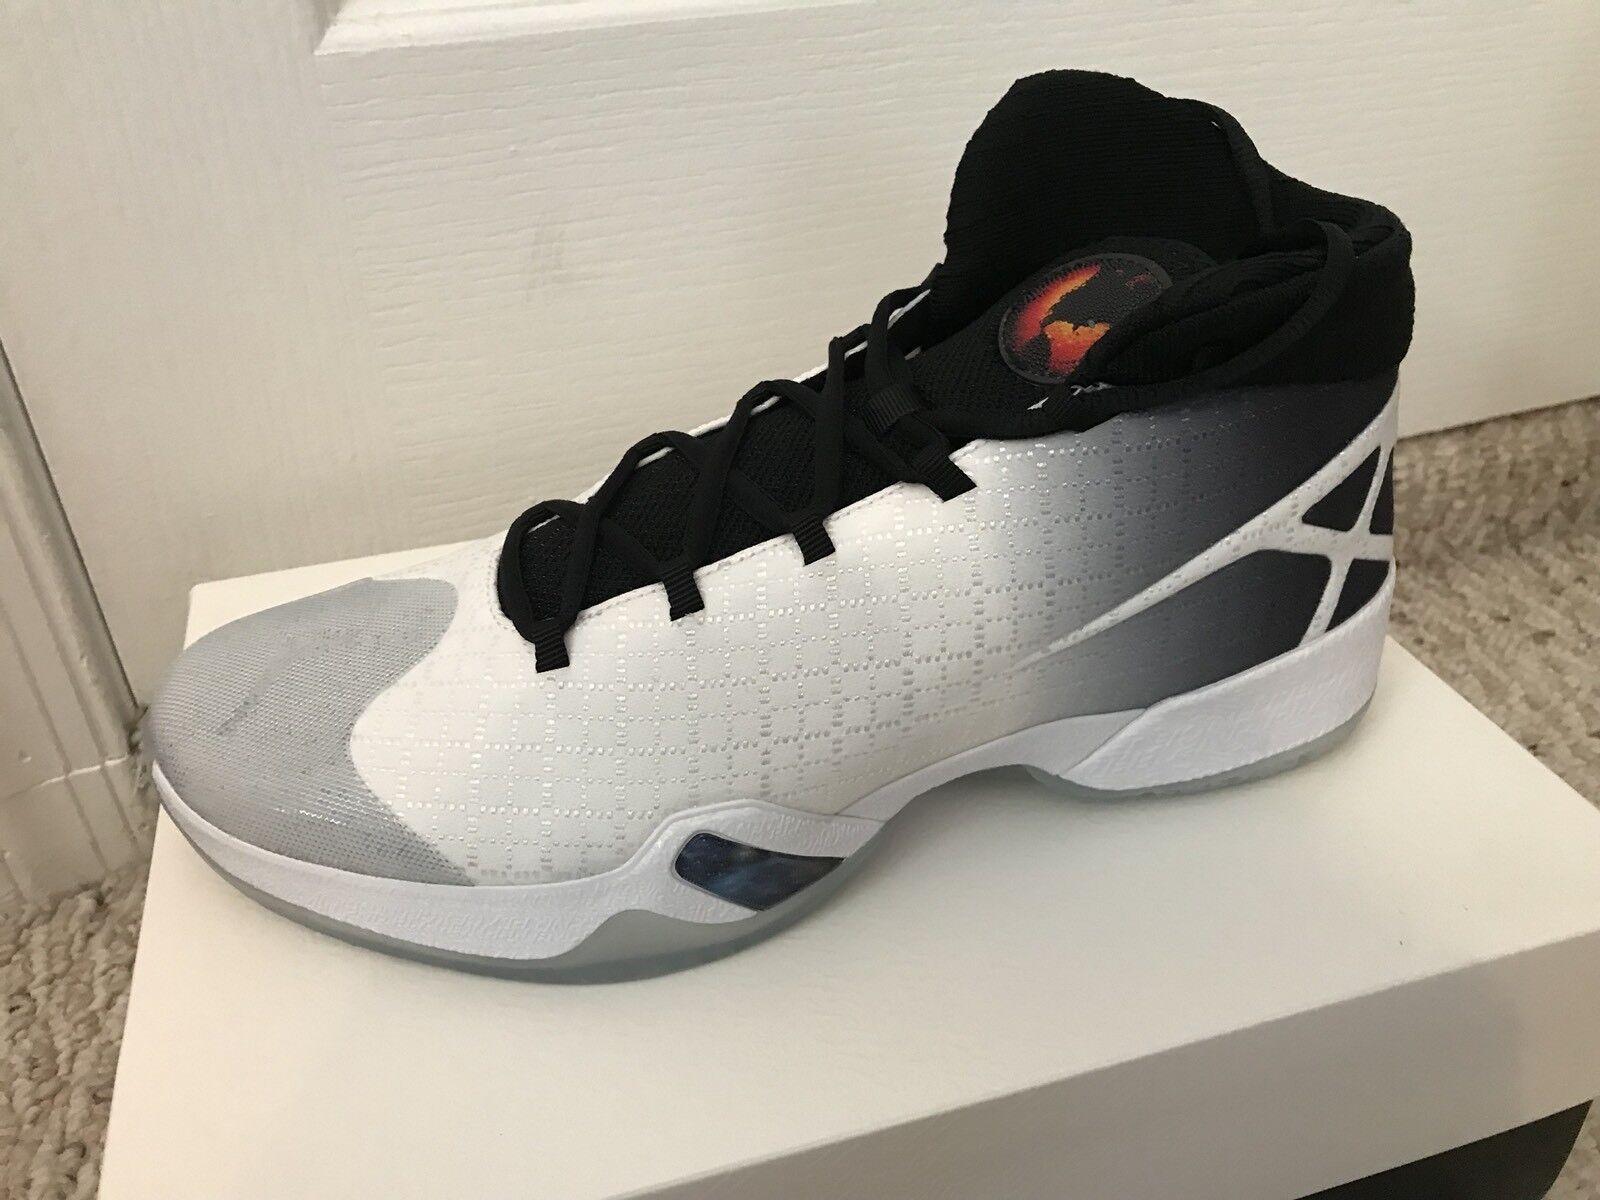 Nike Air Jordan XXX 30 QS Deadstock Size 11 Black White Send OFFERS  No Trades